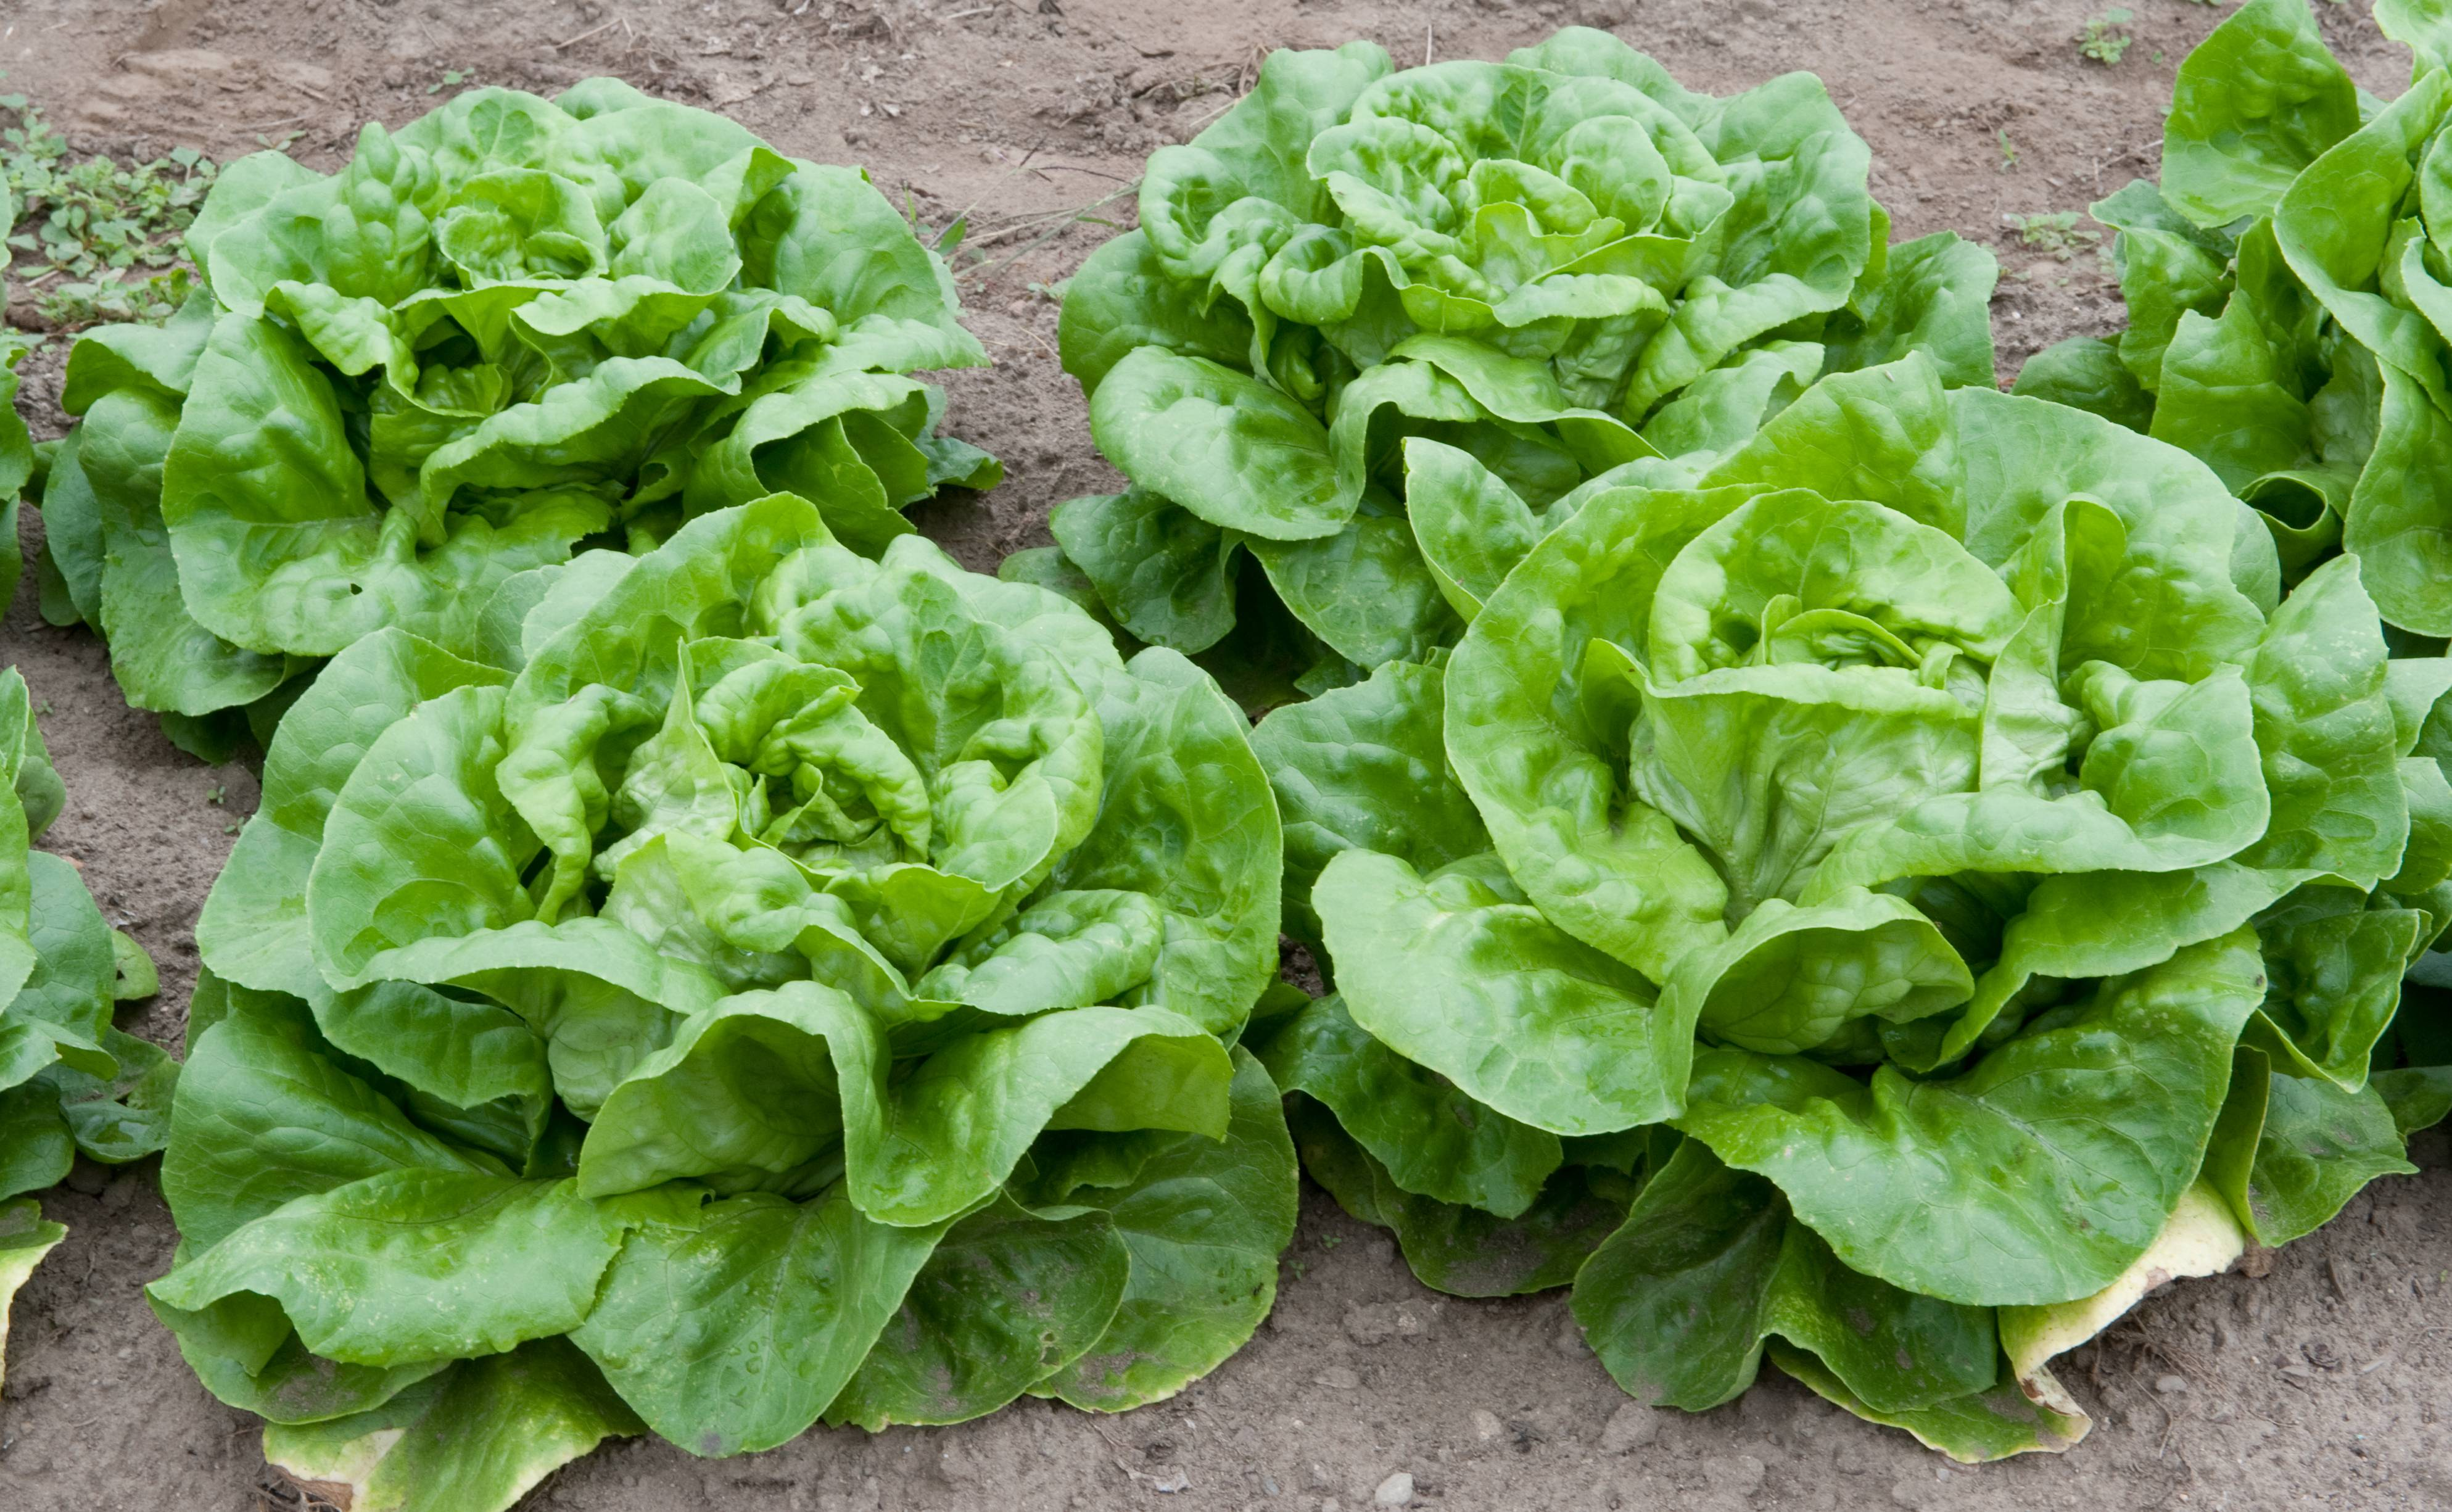 Growing Salad Greens In Raised Beds